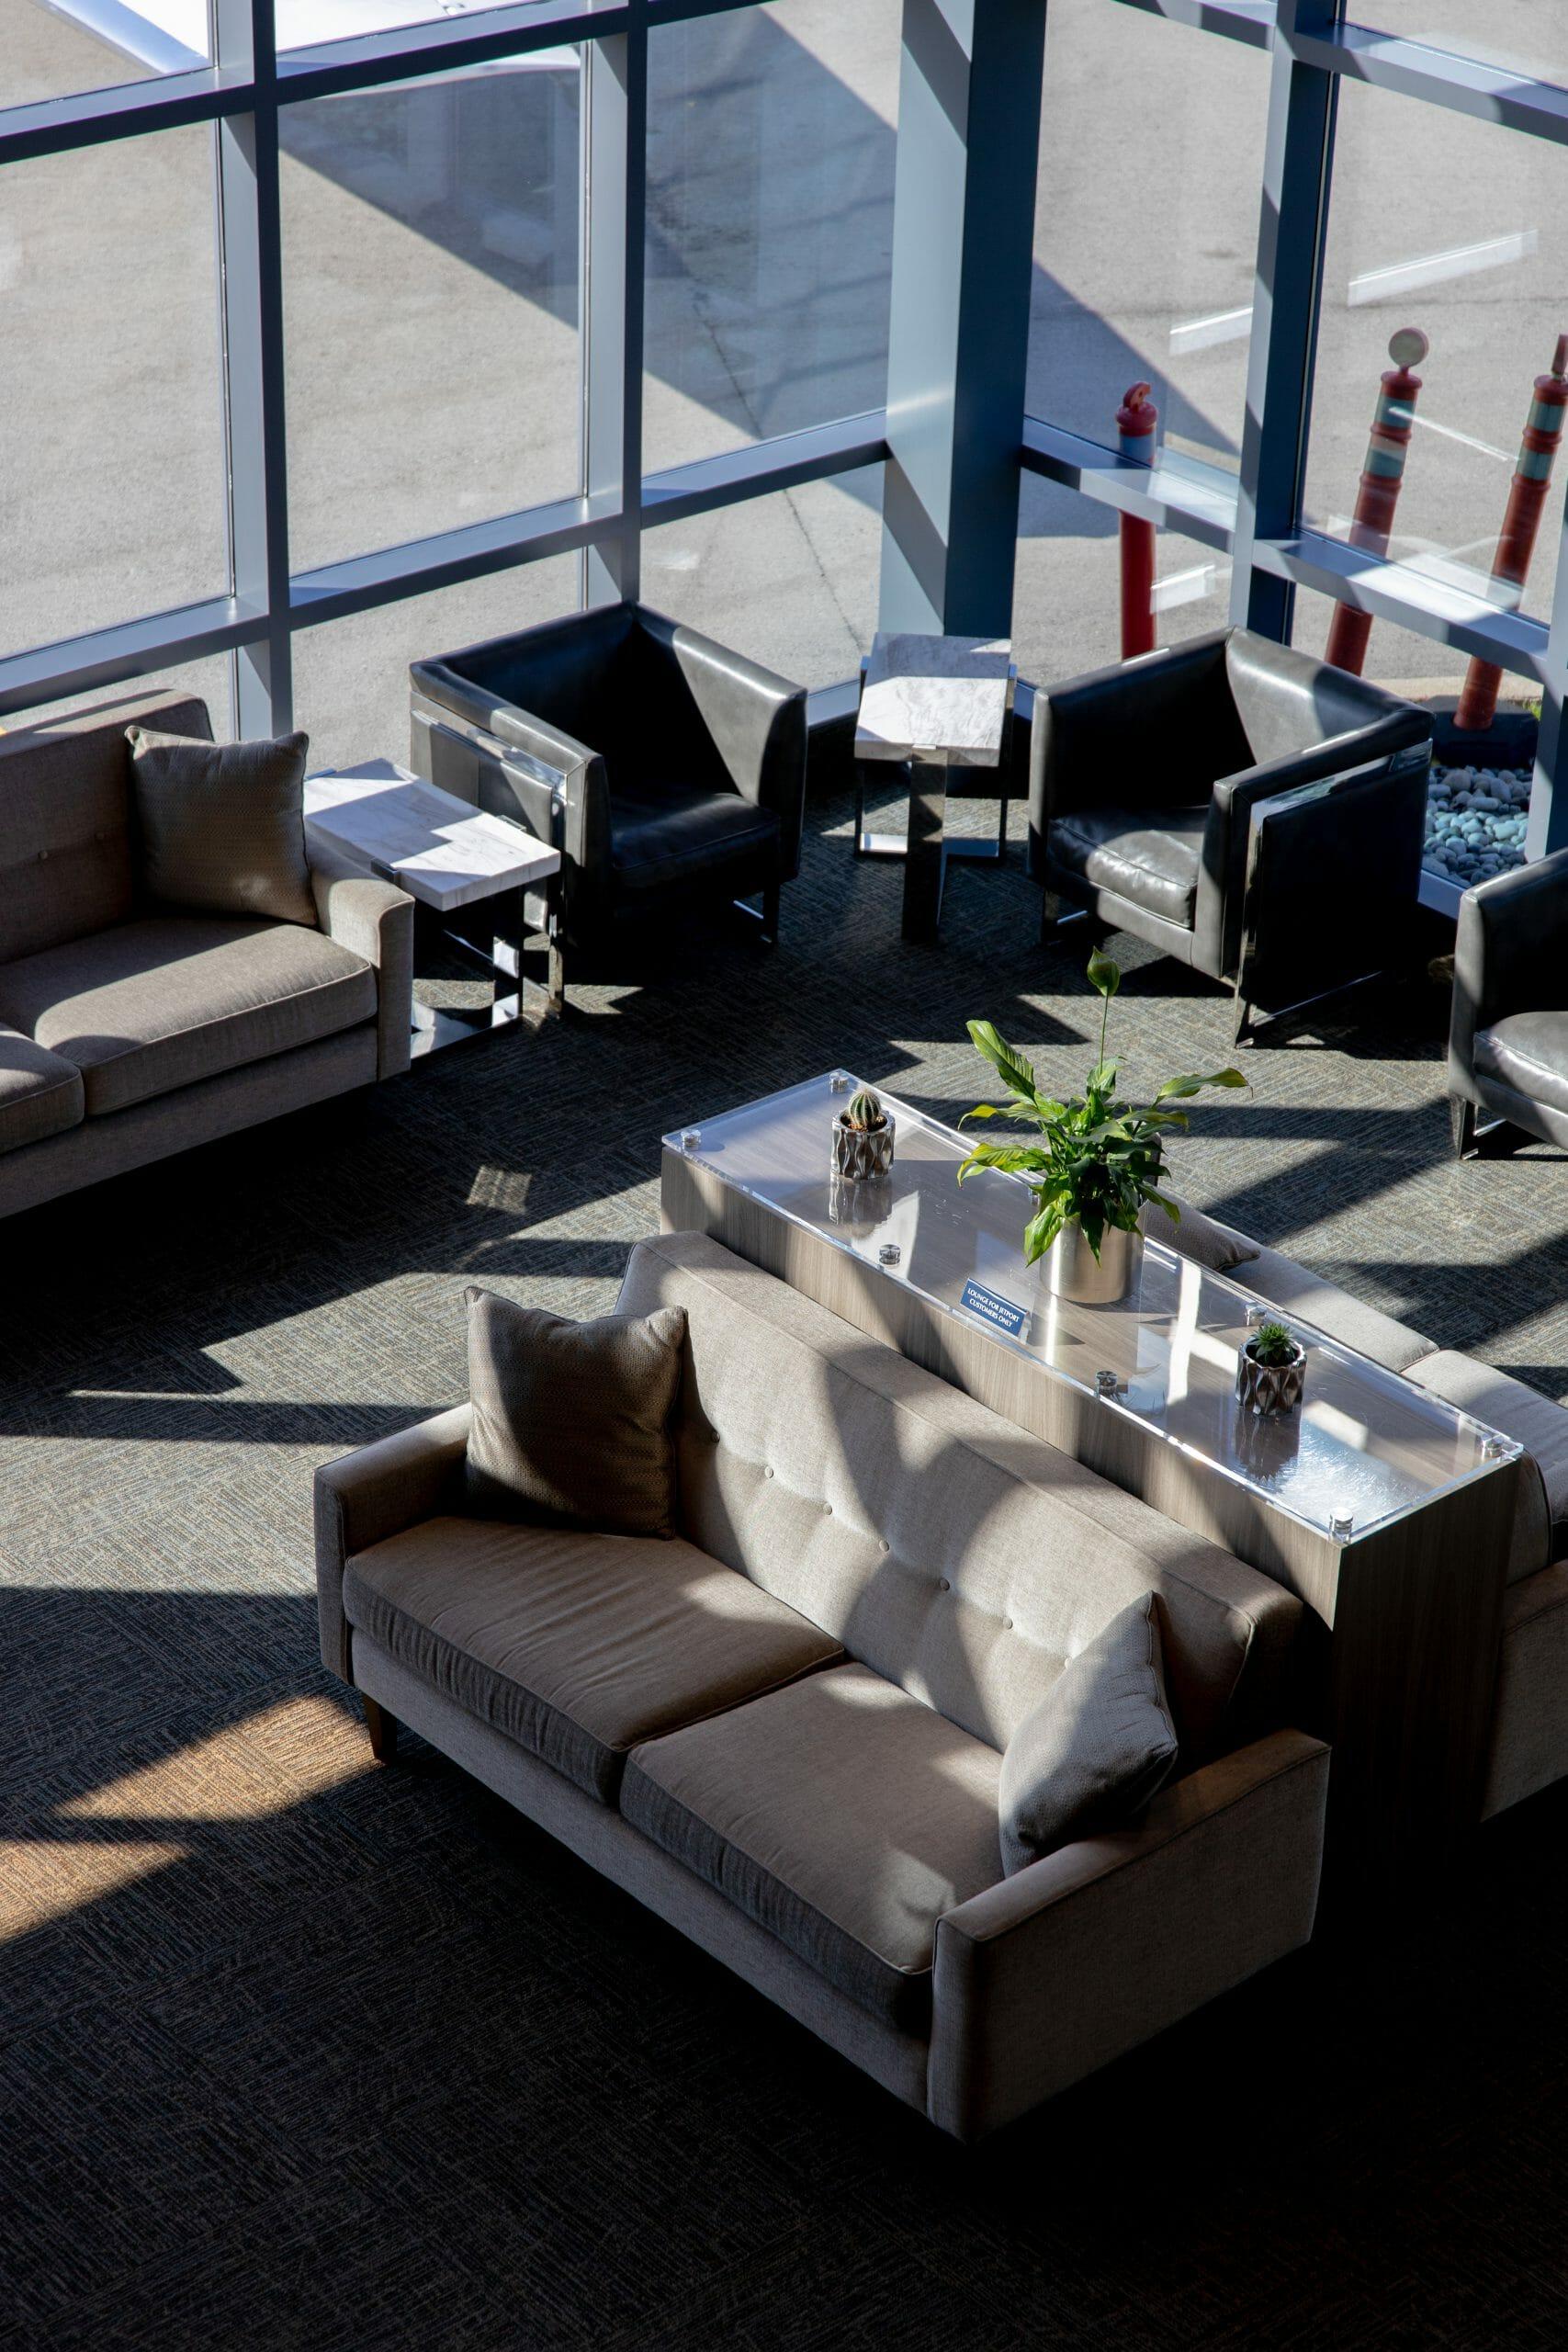 Inside the Jetport Lounge